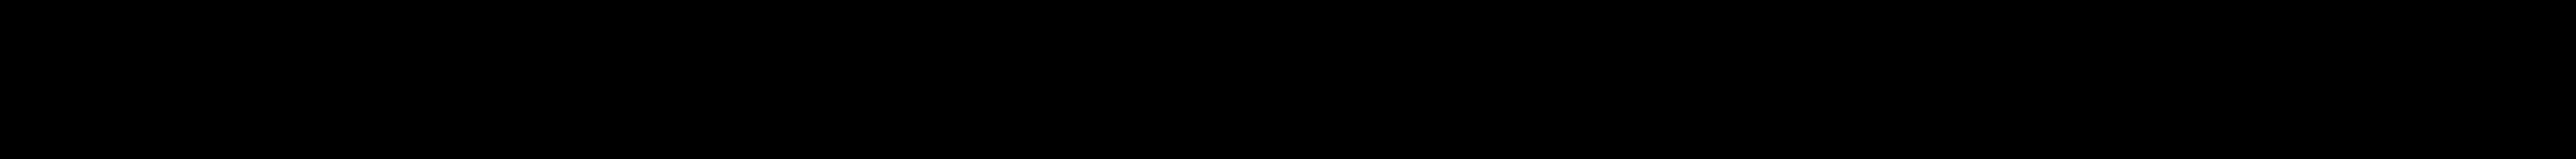 YWFT Formation Regular